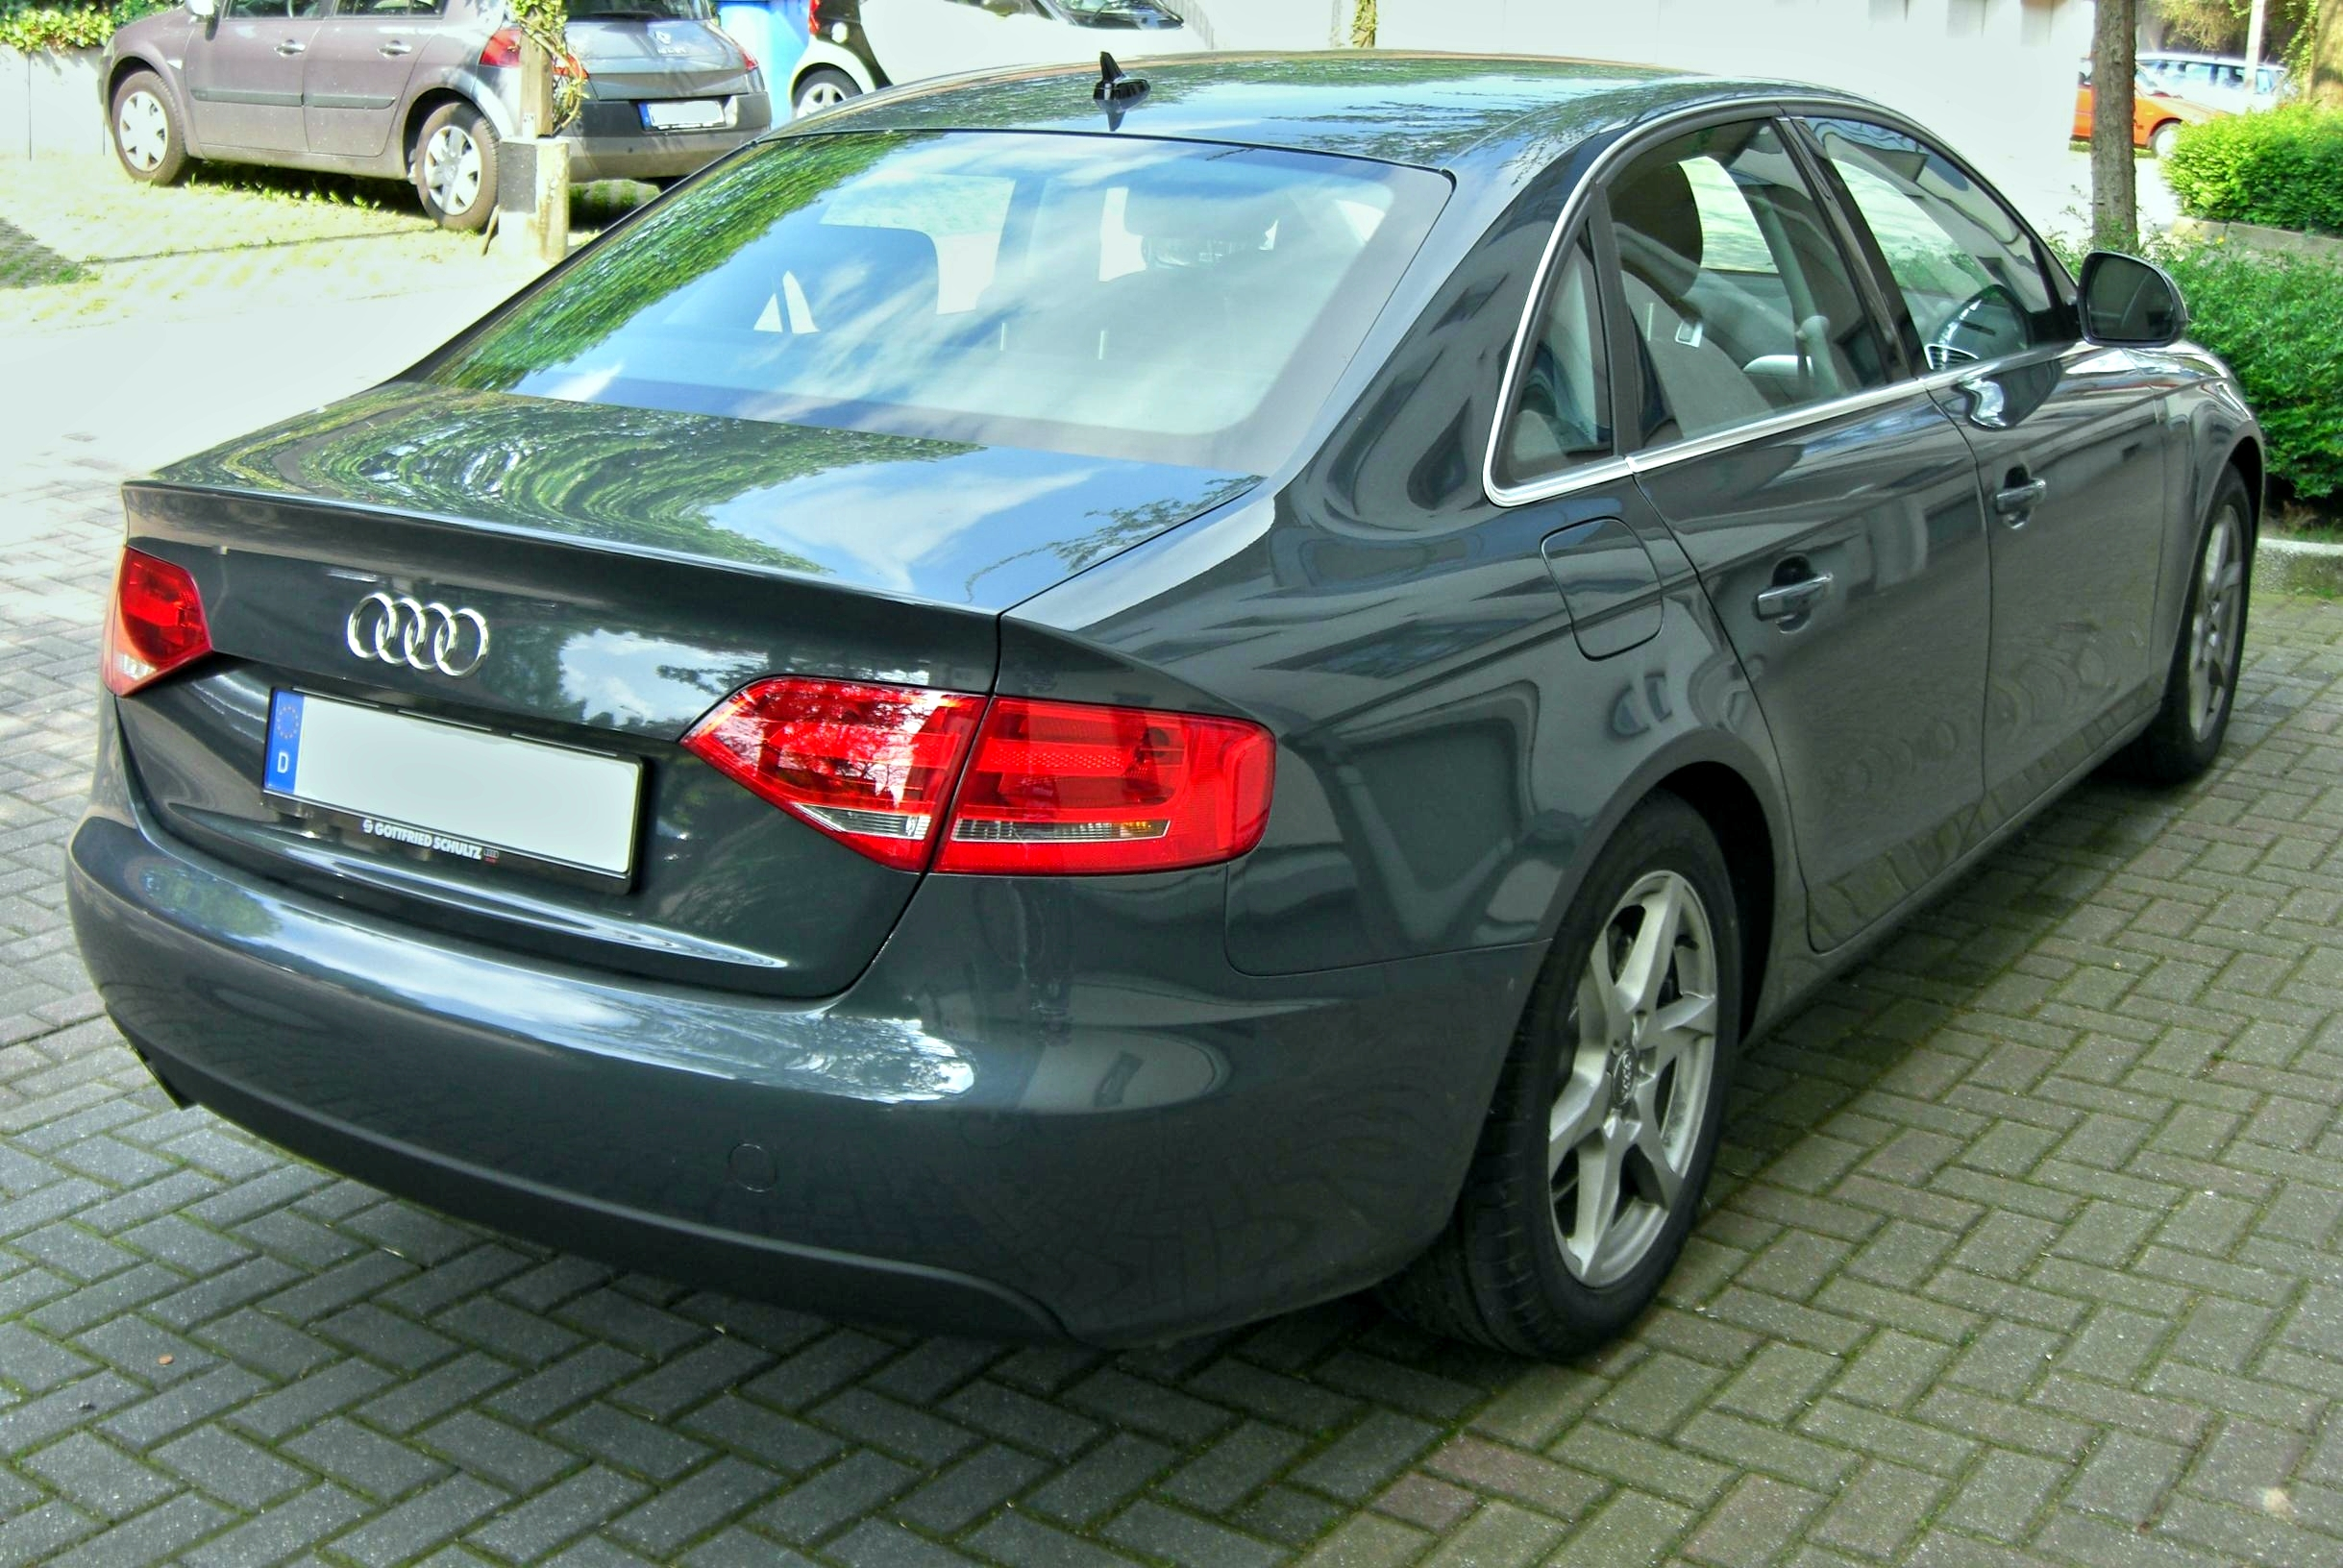 File:Audi A4 B8 rear.jpg - Wikimedia Commons